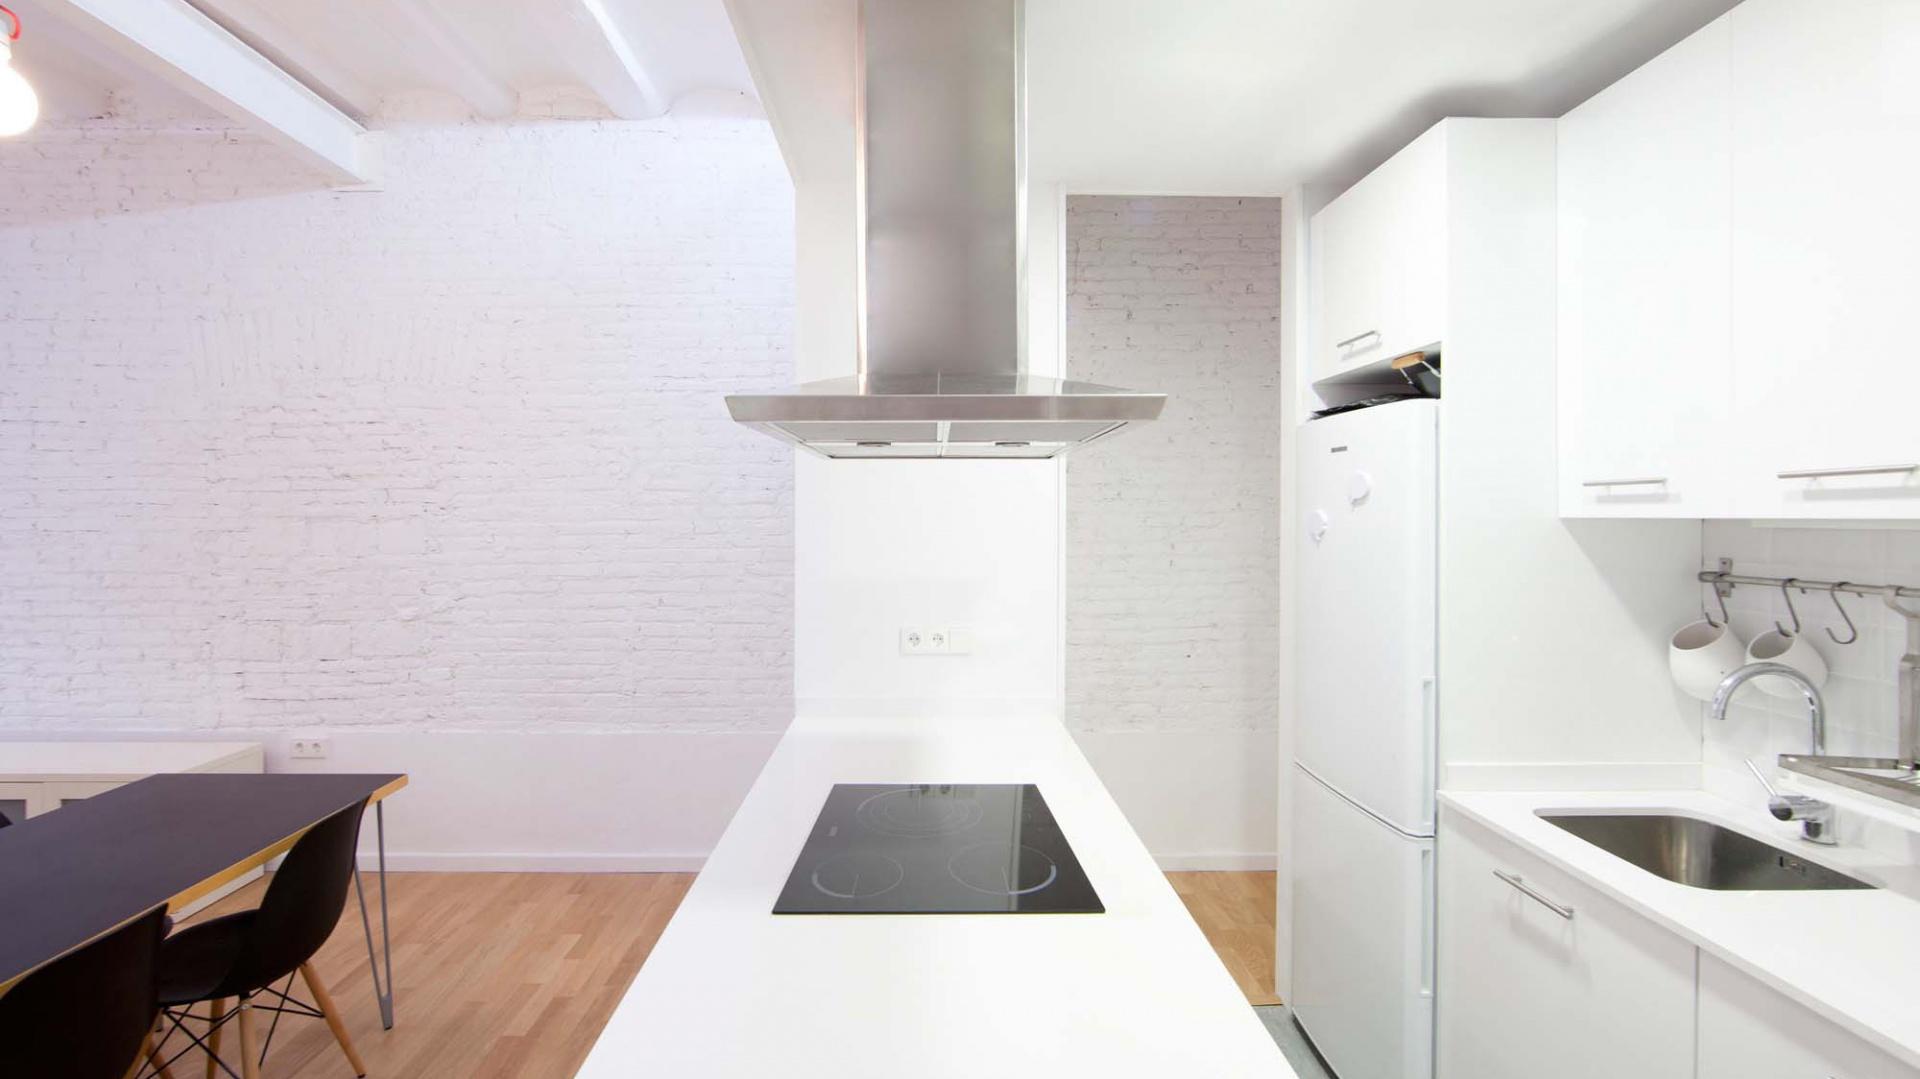 Nowoczesna kuchnia w bieli. Fot. Eva Cotman.